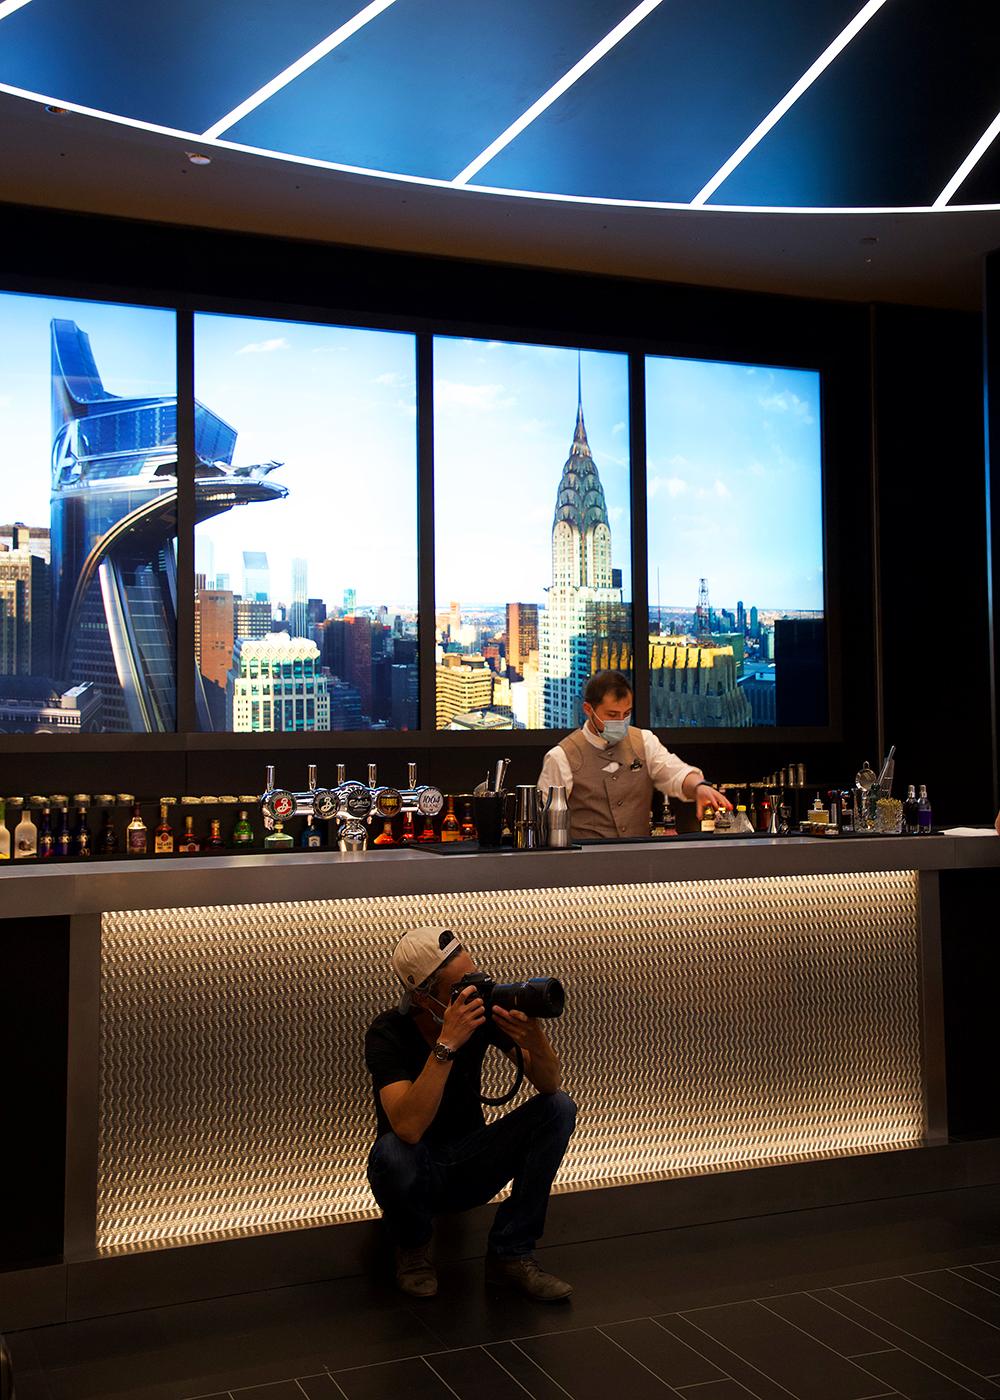 [Trip Report DLP] Découverte du Disney's Hotel New York – The Art of Marvel ! Zz_skyline_1